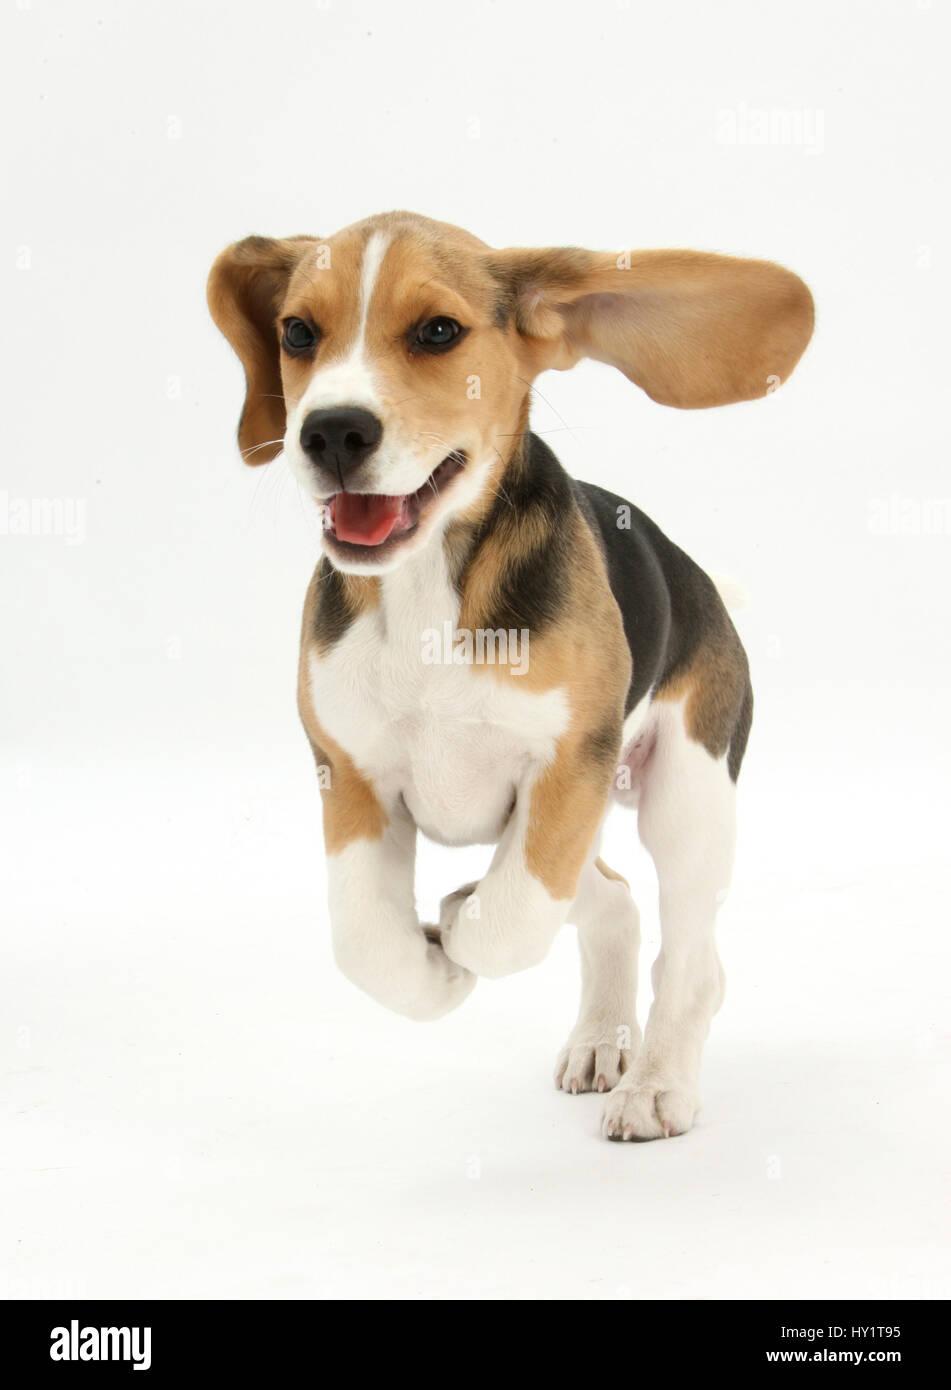 Beagle puppy running. - Stock Image